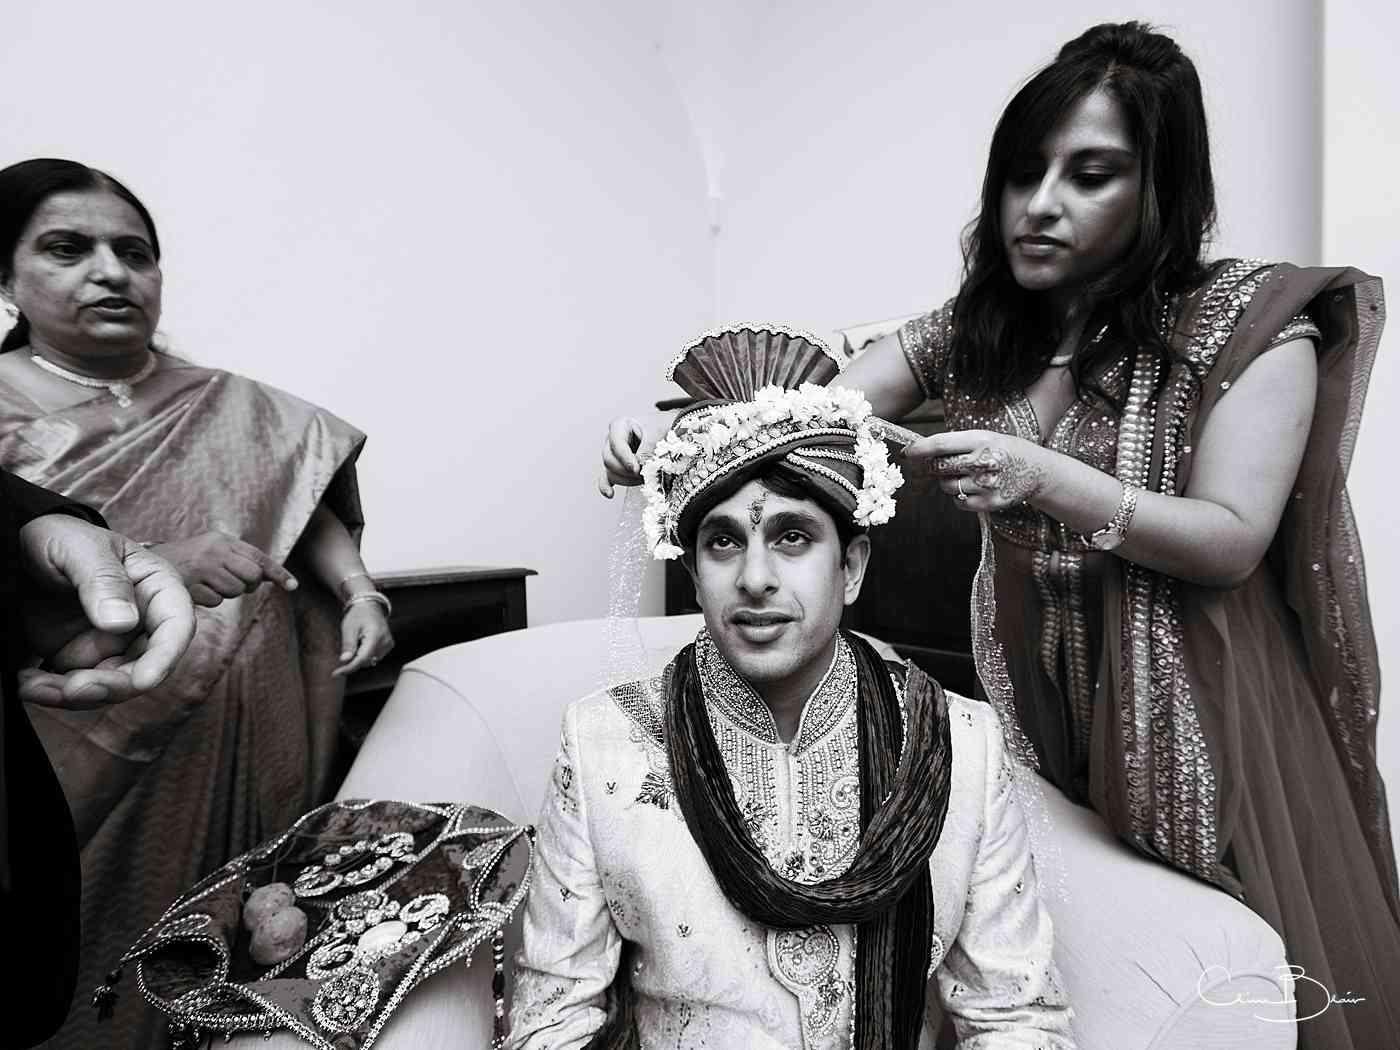 Groom having his turban put on before his weddingceremony